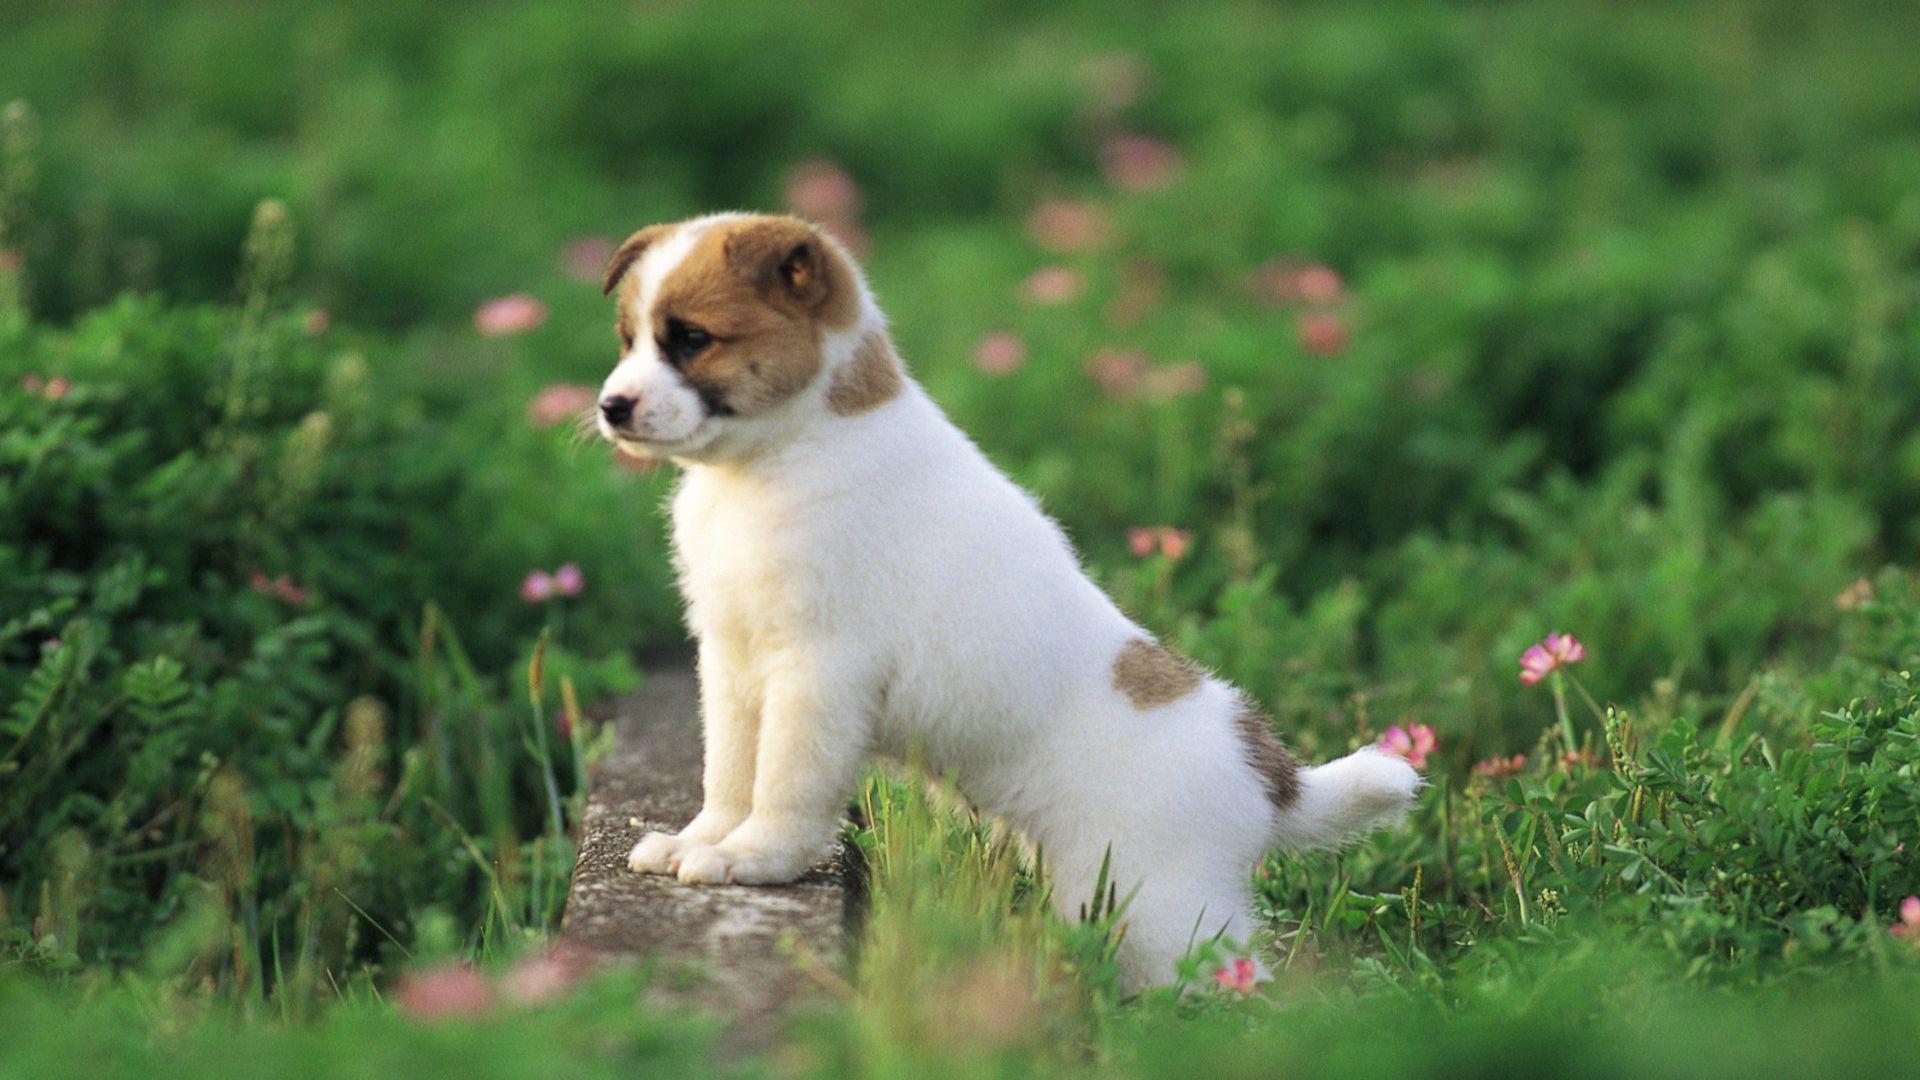 Cute Puppies #16